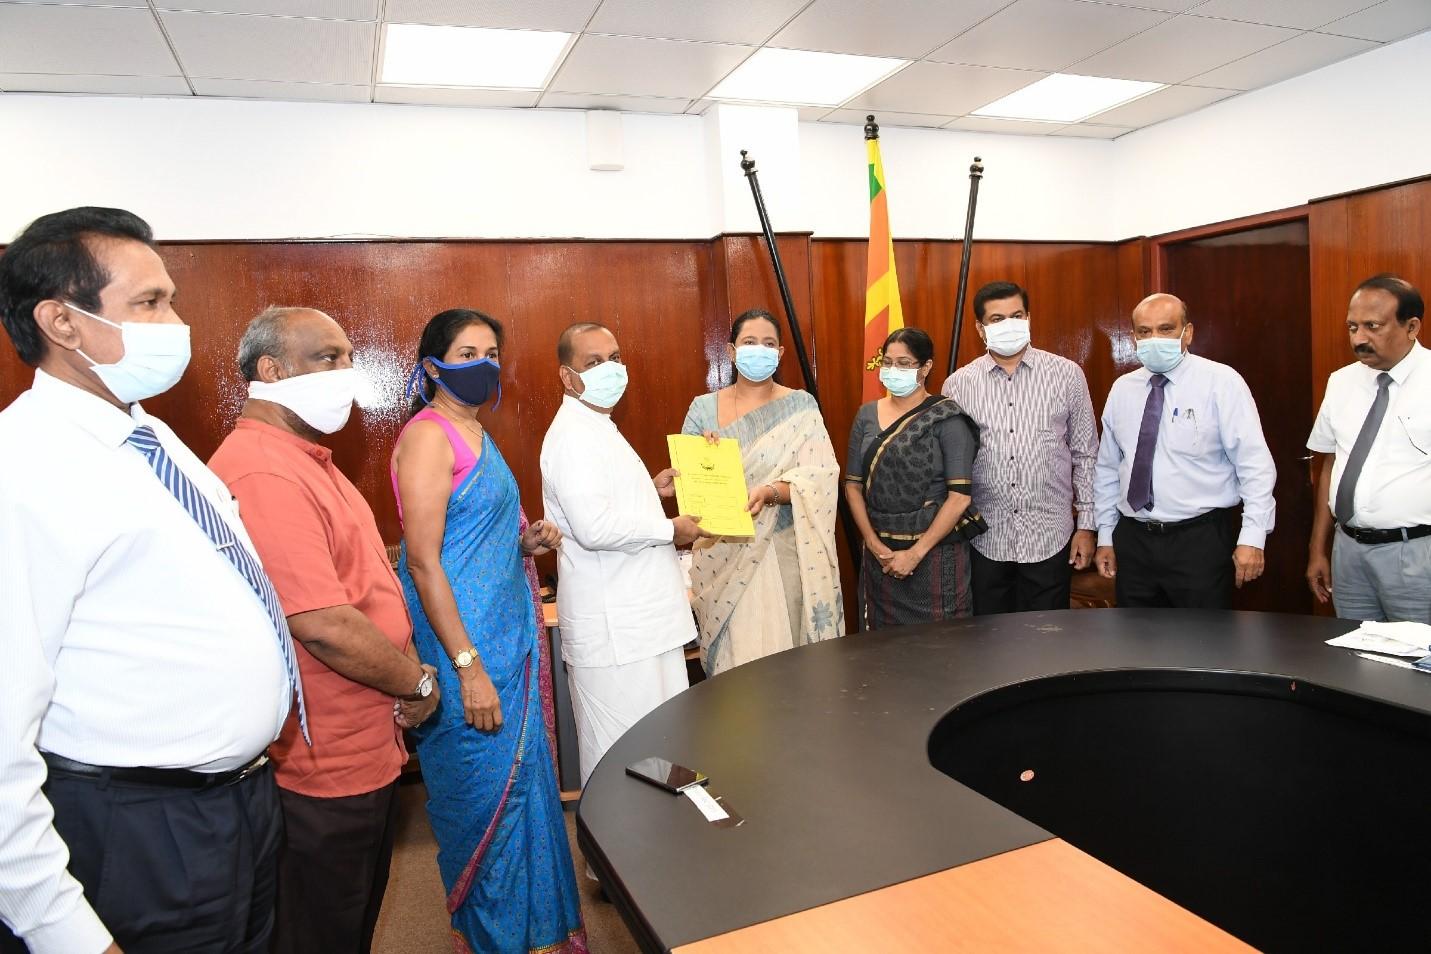 LKR 23 million worth IAEA's donation, COVID-19 identification systems handed over to Sri Lanka Ministry of Health